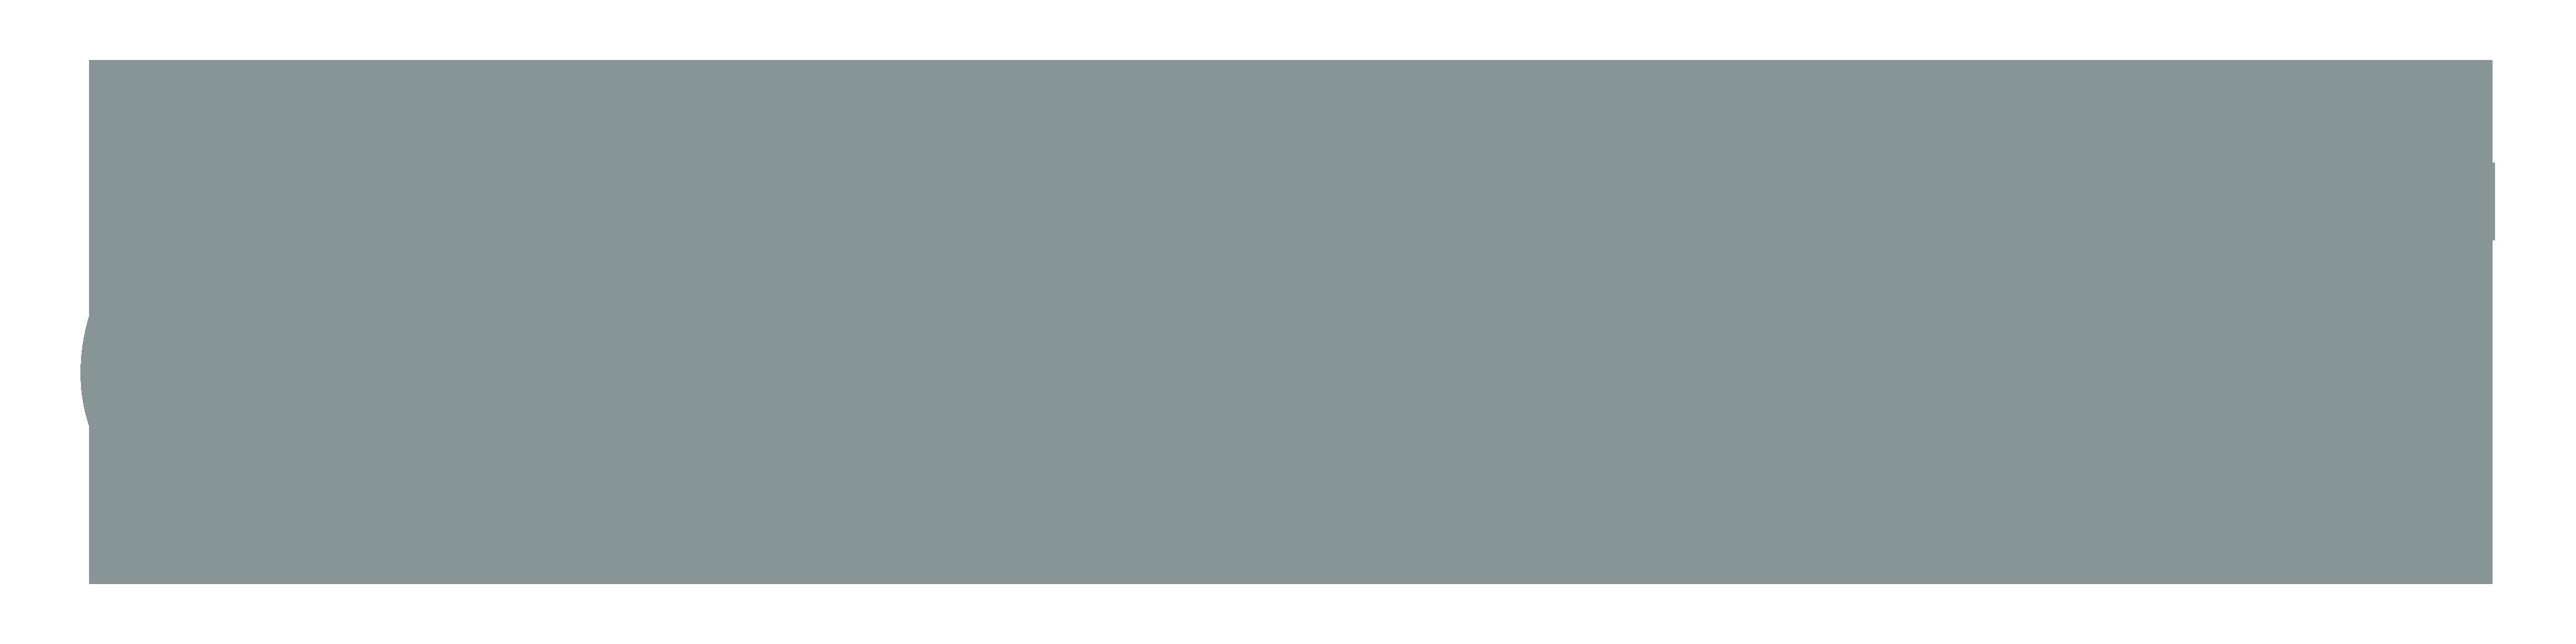 Afterbuy logo